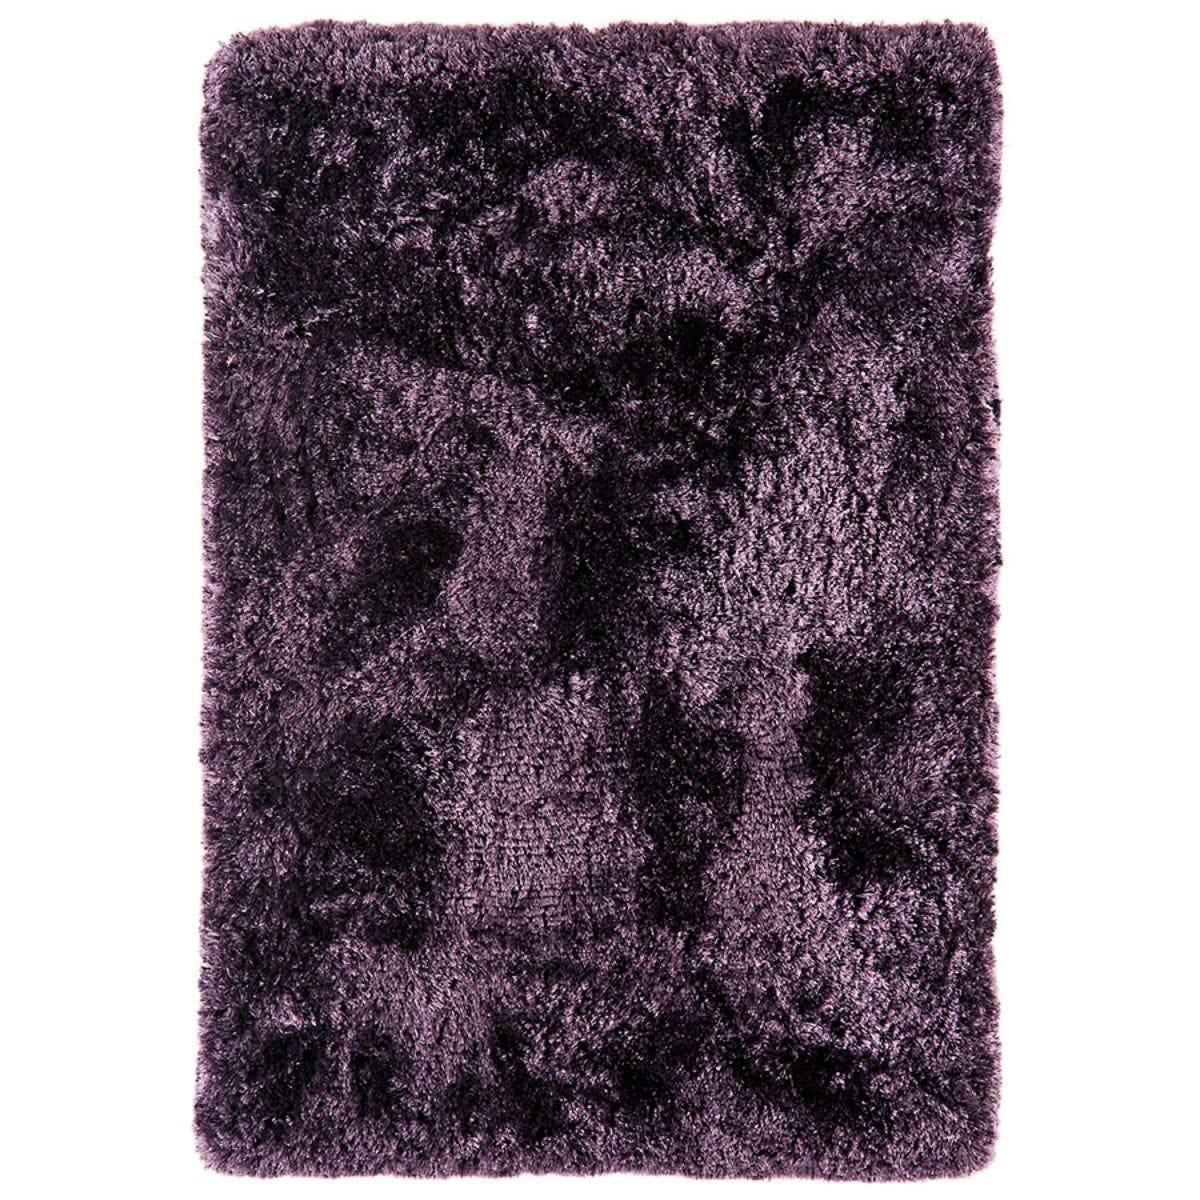 Asiatic Plush Shaggy Rug, 120 x 170cm - Purple